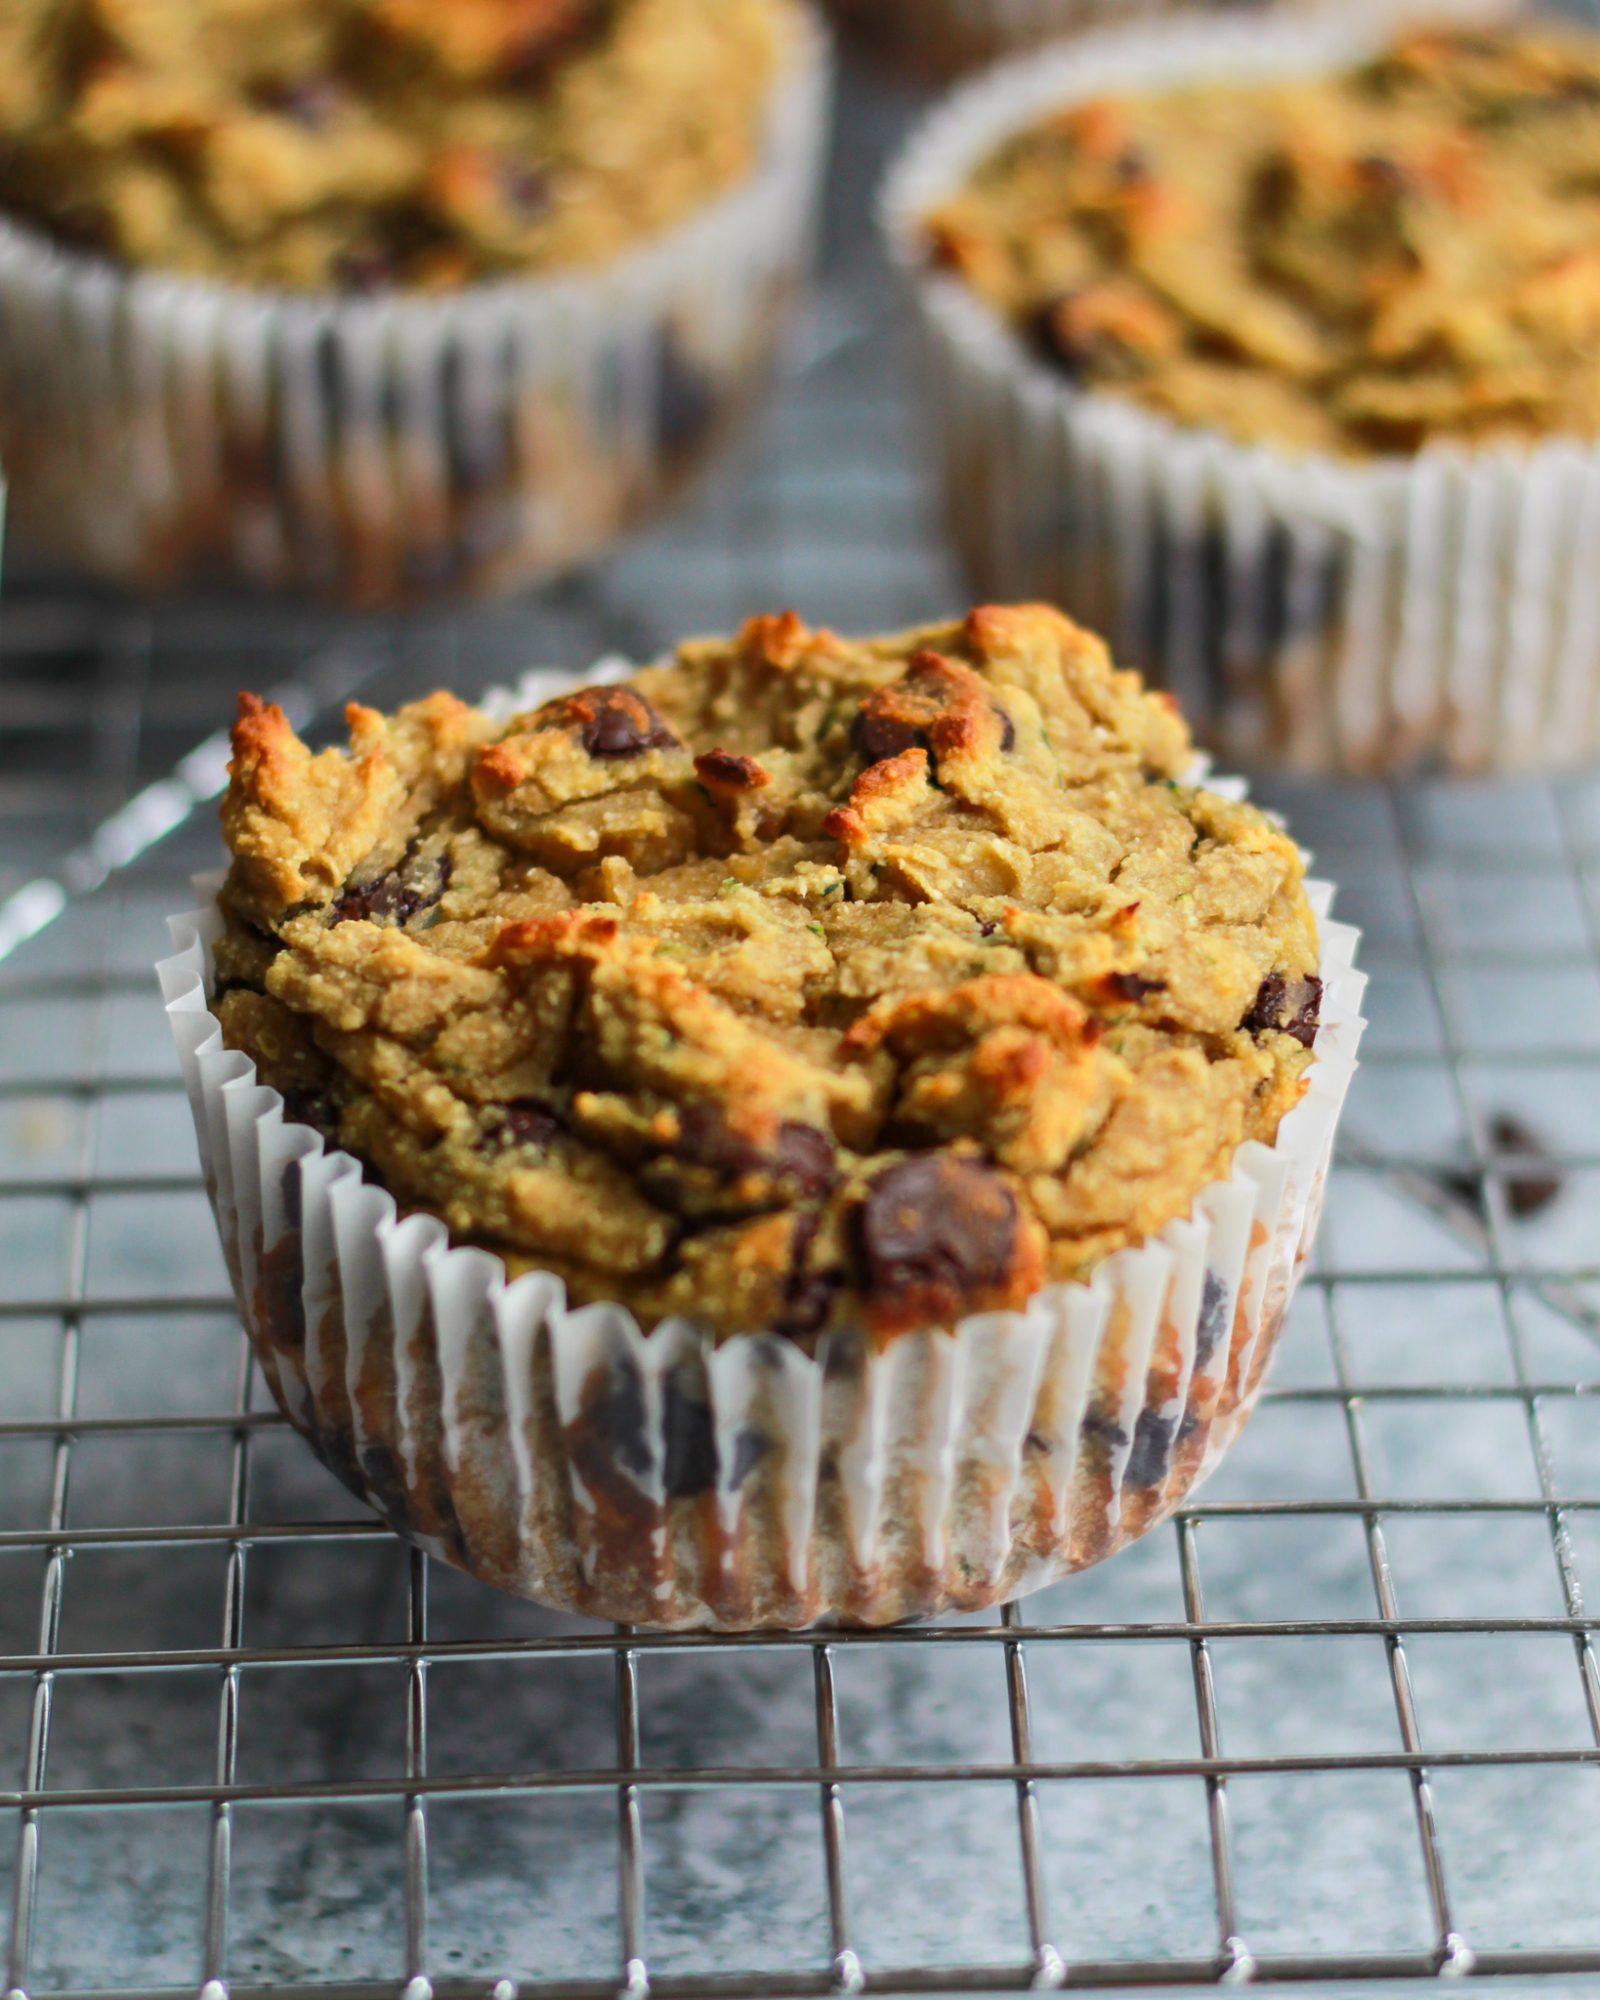 paleo chocolate chip zucchini muffin on cooling rack